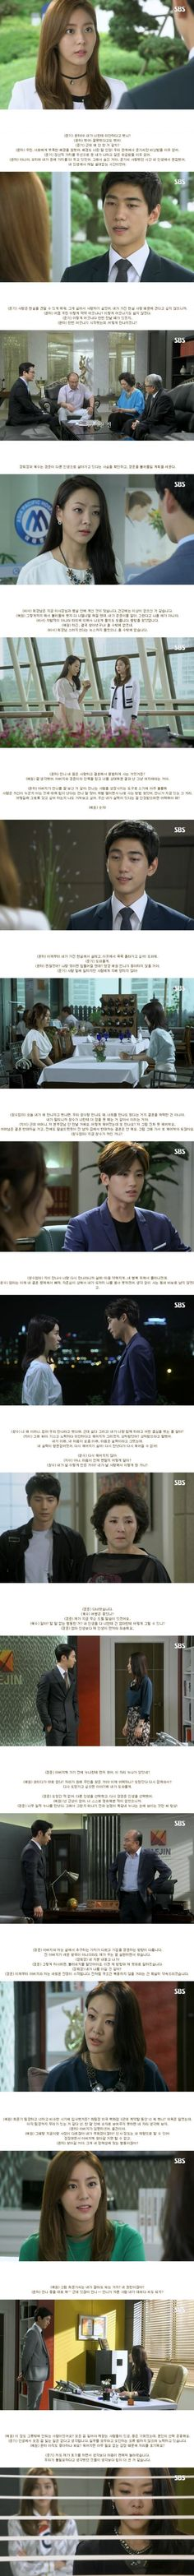 [Spoiler] Added episode 15 captures for the Korean drama 'High Society' @ HanCinema :: The Korean Movie and Drama Database